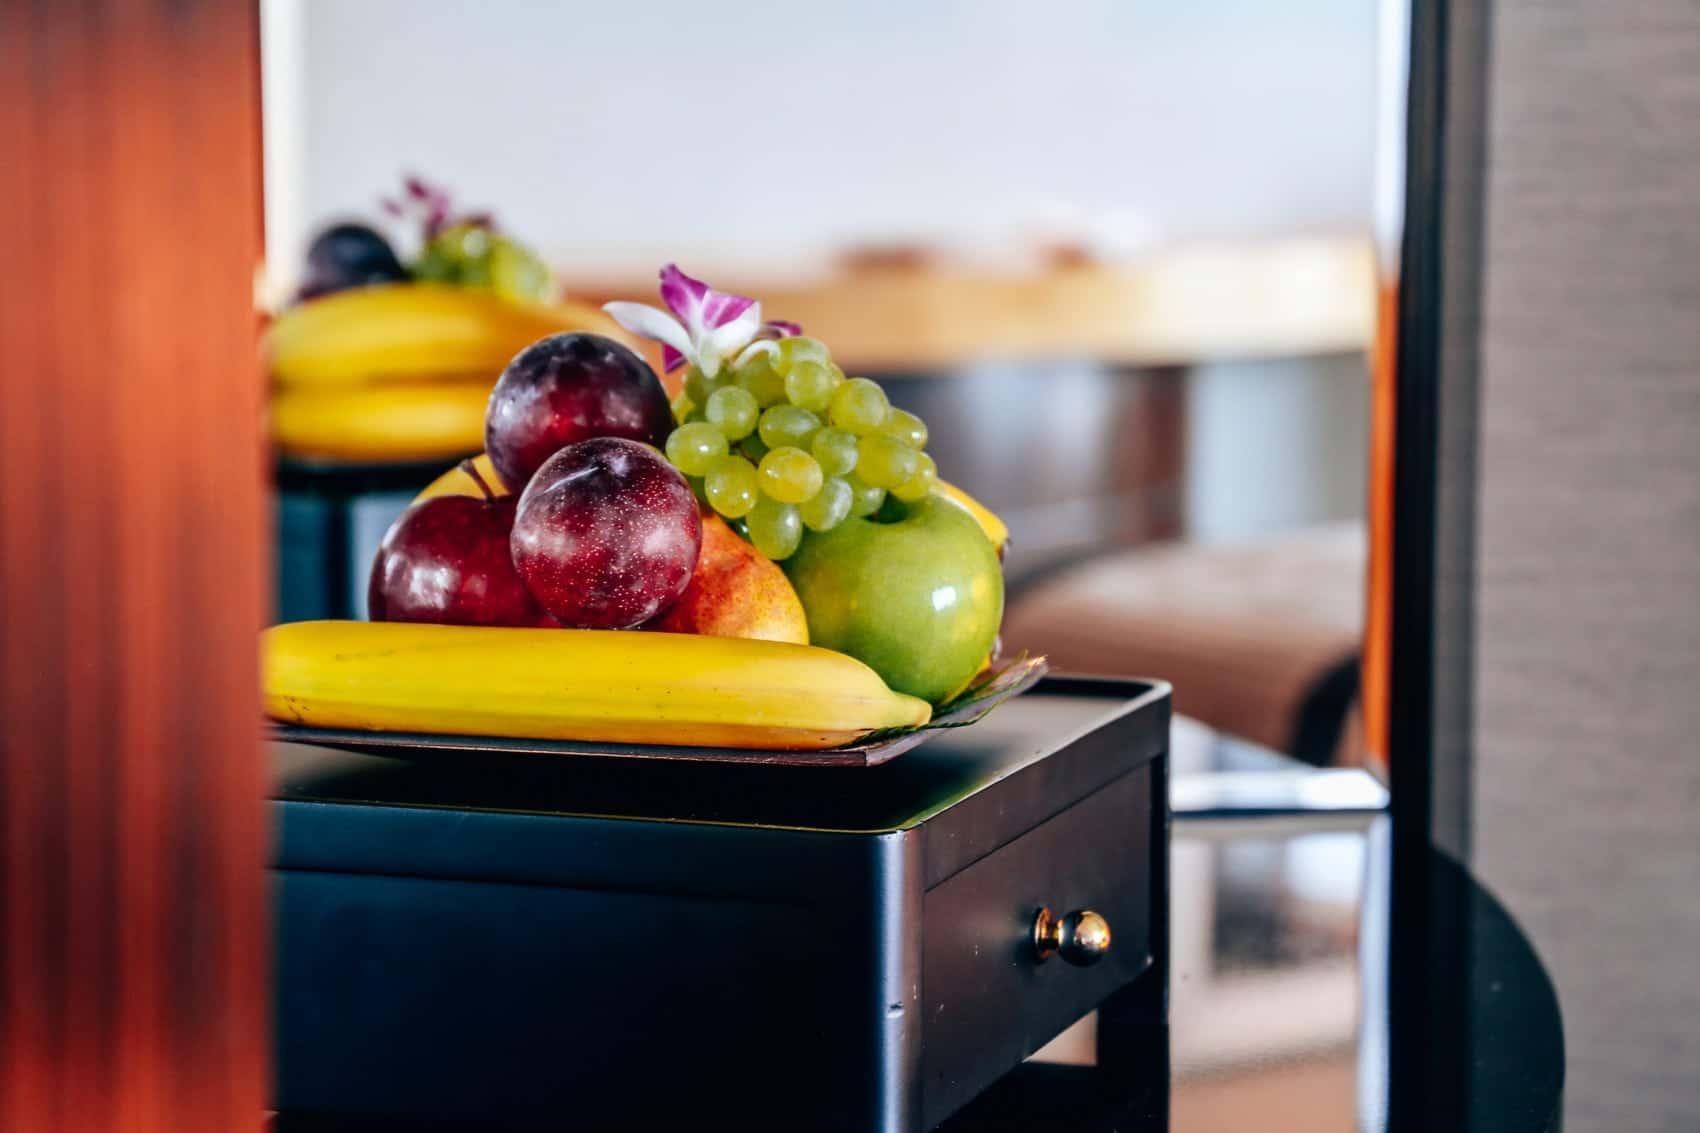 luxushotel-shangri-la-dubai-zimmer-pool-mit-blick-auf-den-burj-khalifa-reiseblog-des-belles-choses 21